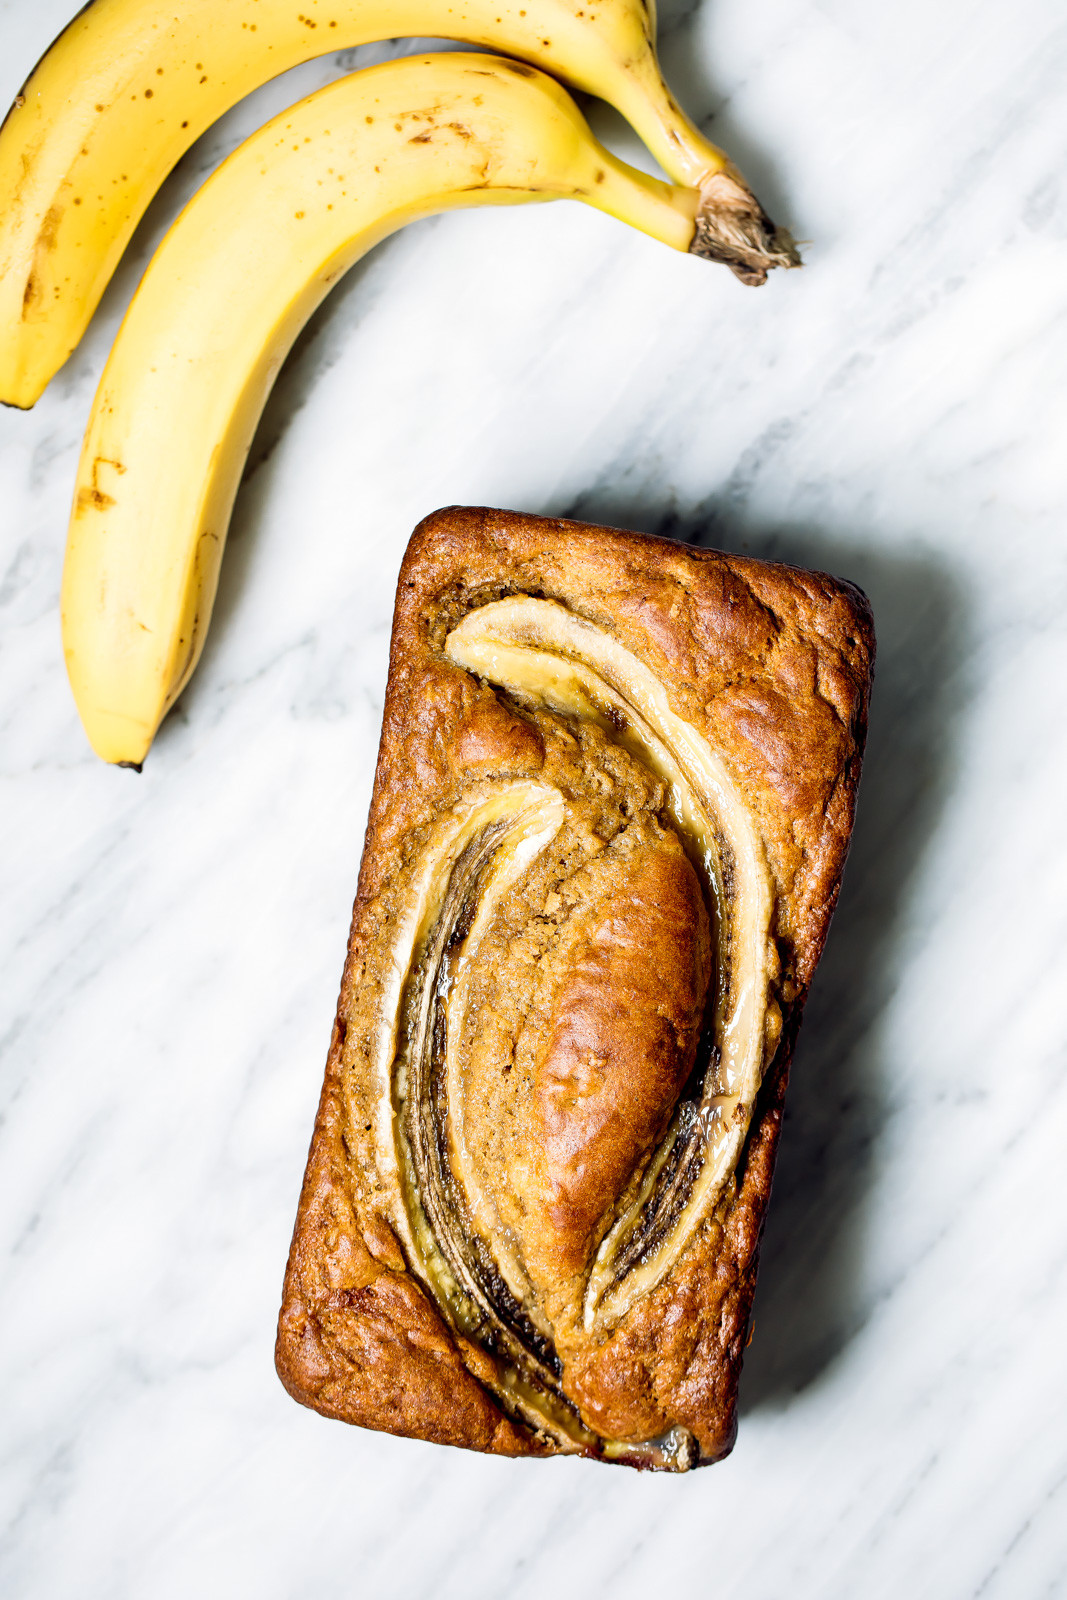 Healthy Bake Bread  My Favorite Healthy Banana Bread Recipe why baking is